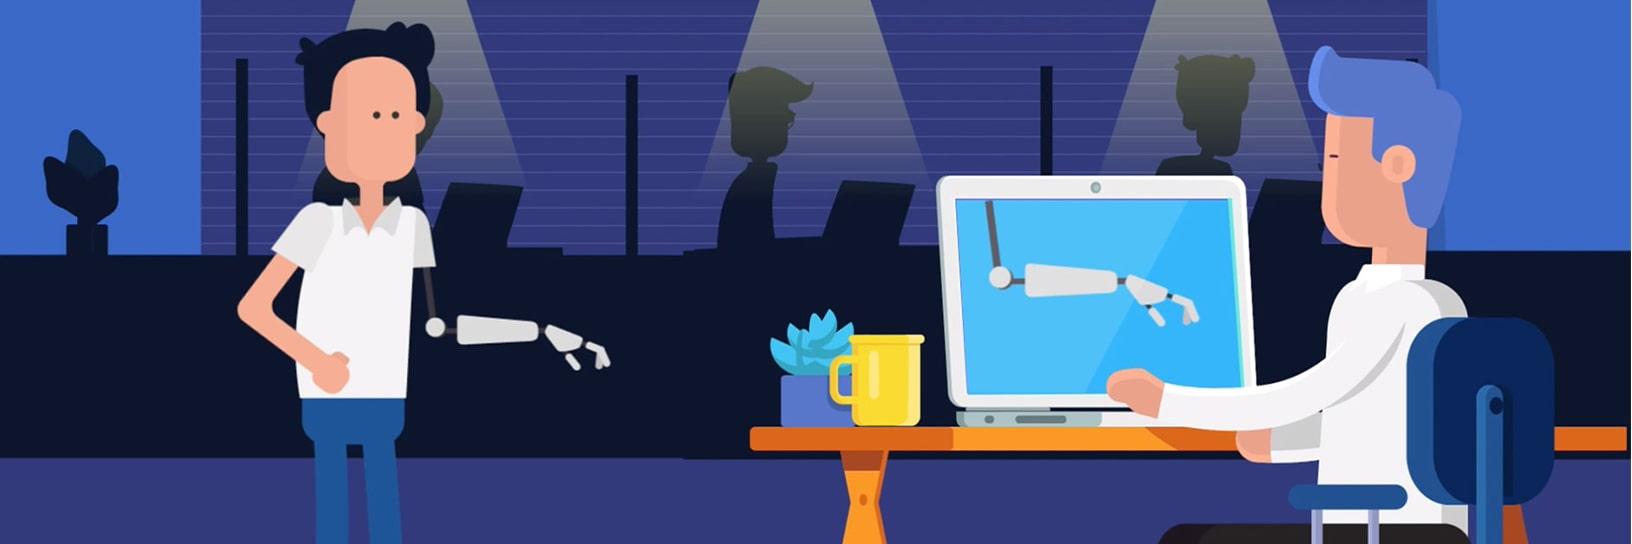 Microsoft - Media Production Egypt - Video Production Egypt - Creative and Digital Agency Egypt